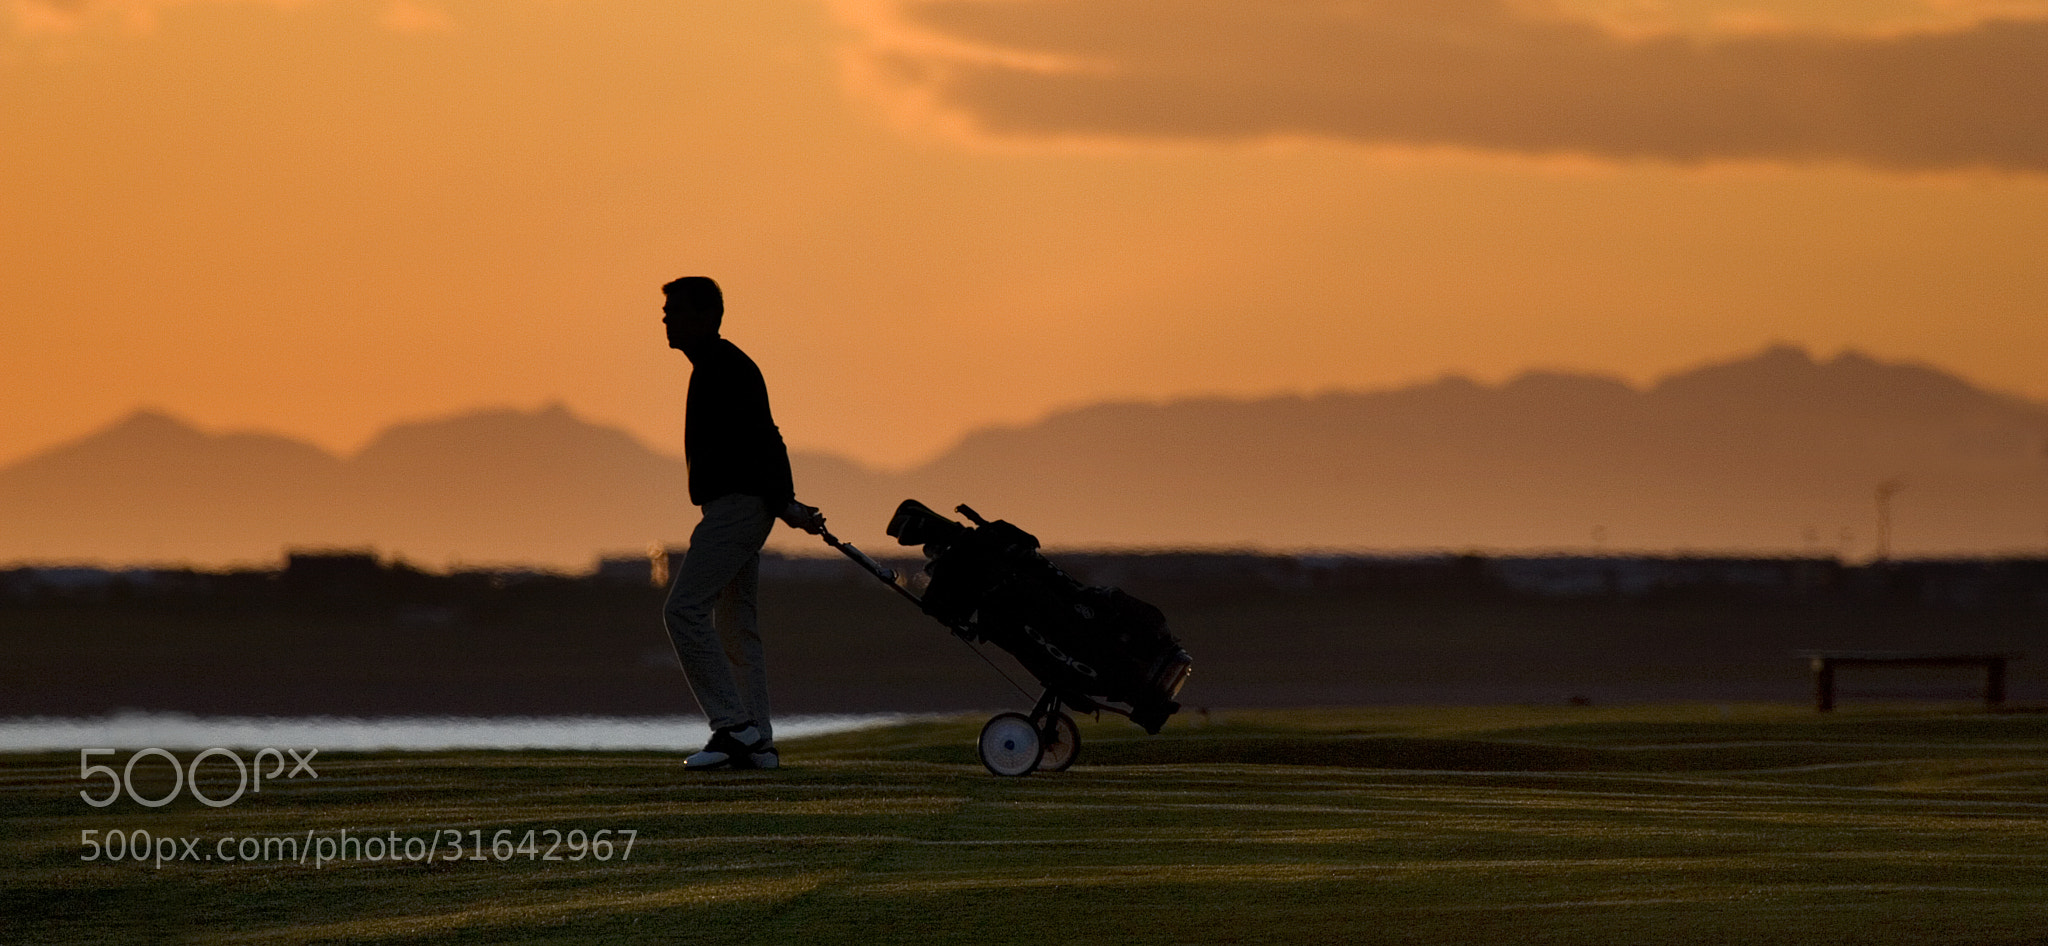 Photograph Golf by Marius Edvardsson on 500px